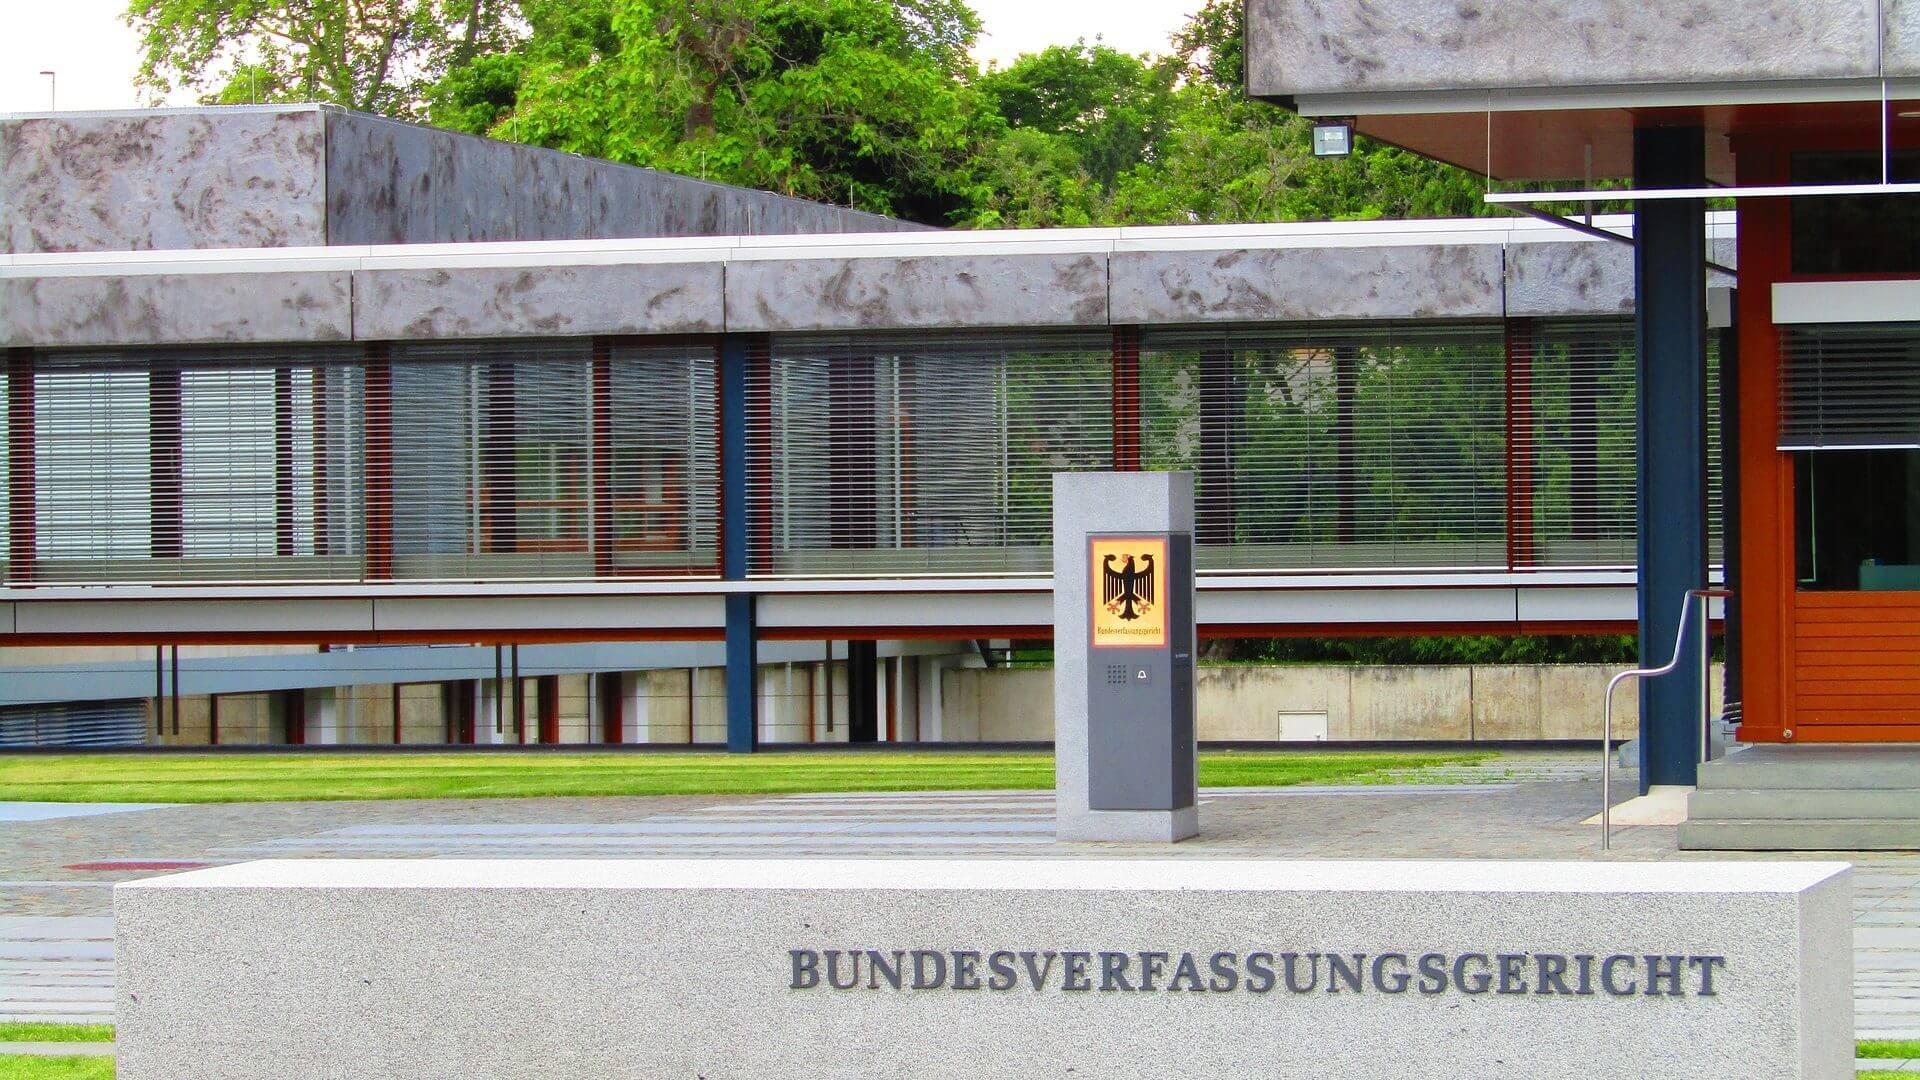 Bundesverfassungsgericht Udo Pohlmann Pixabay